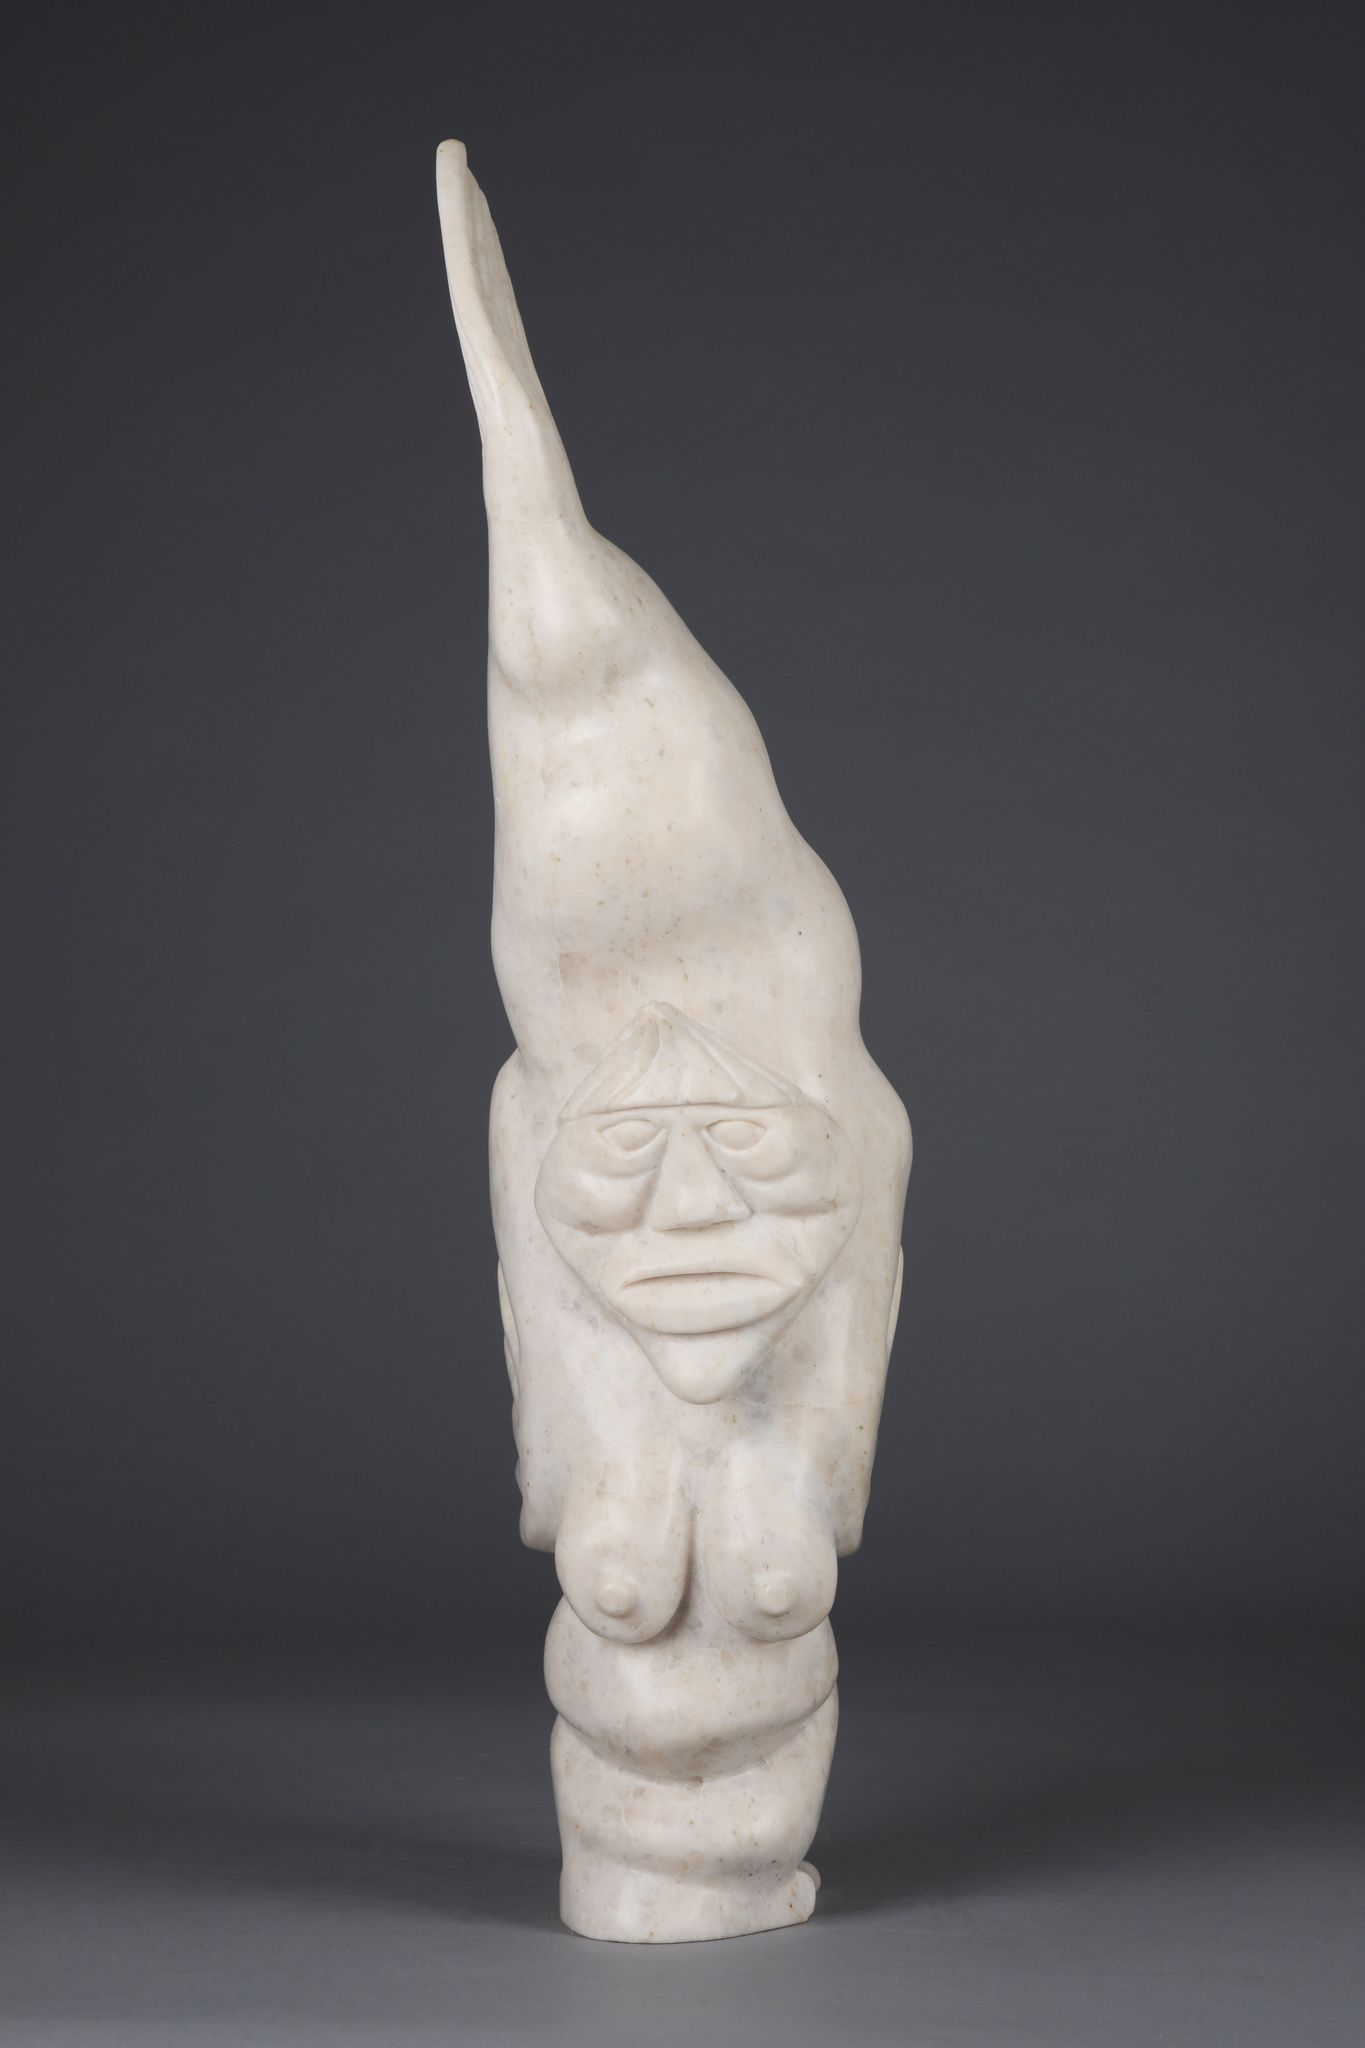 Anthropo-/ zoomorphe Figur